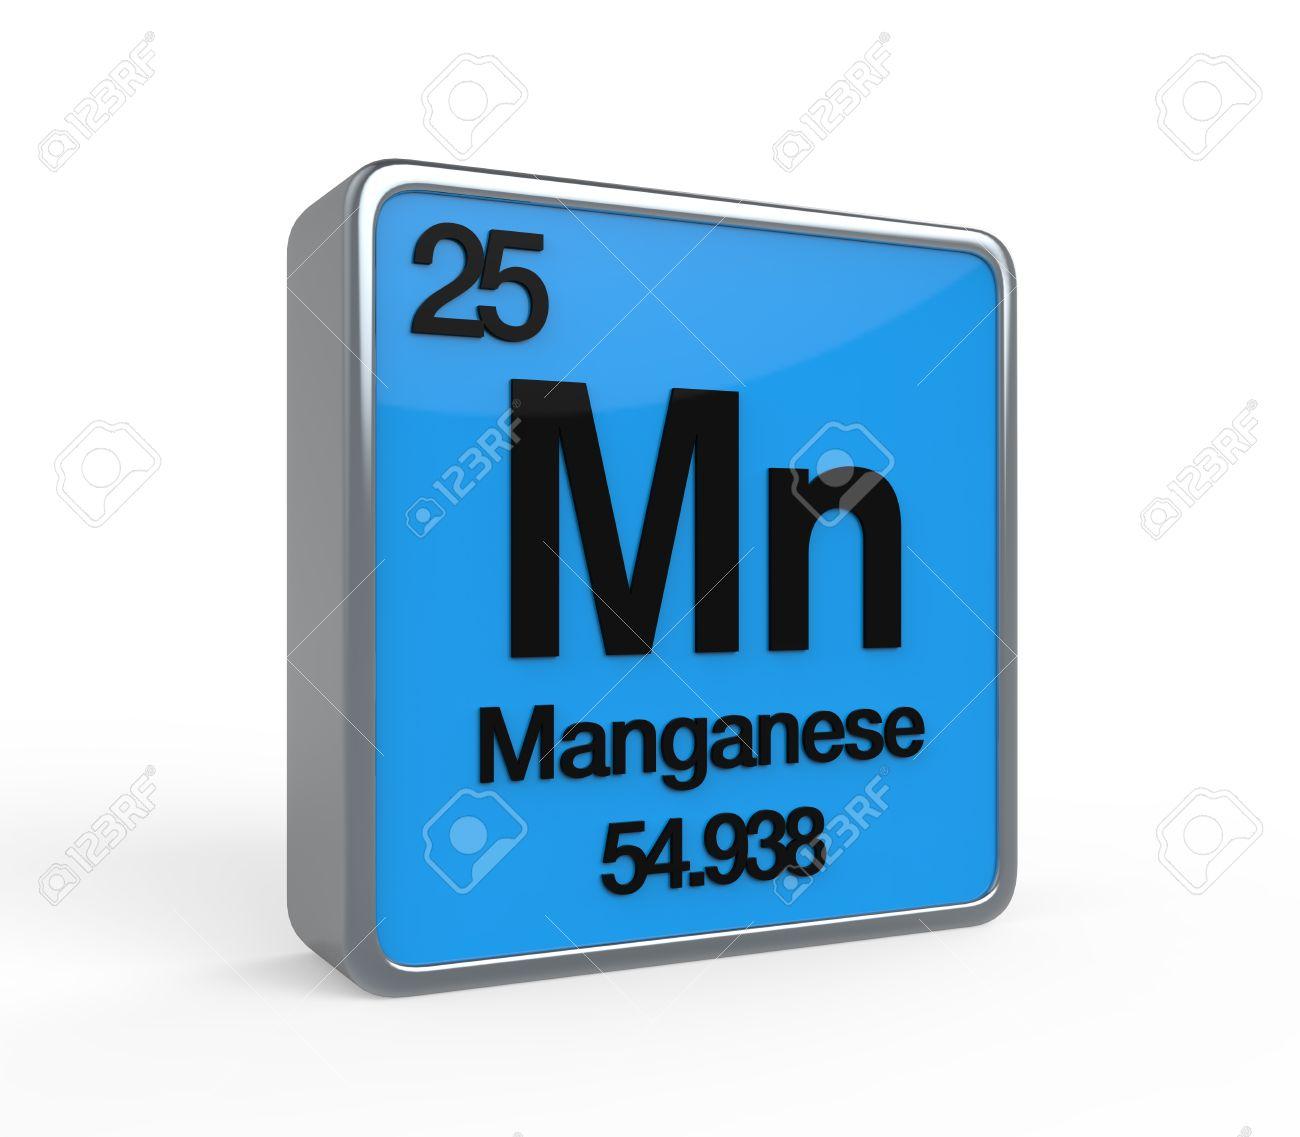 Manganeso tabla peridica elemento fotos retratos imgenes y foto de archivo manganeso tabla peridica elemento urtaz Image collections